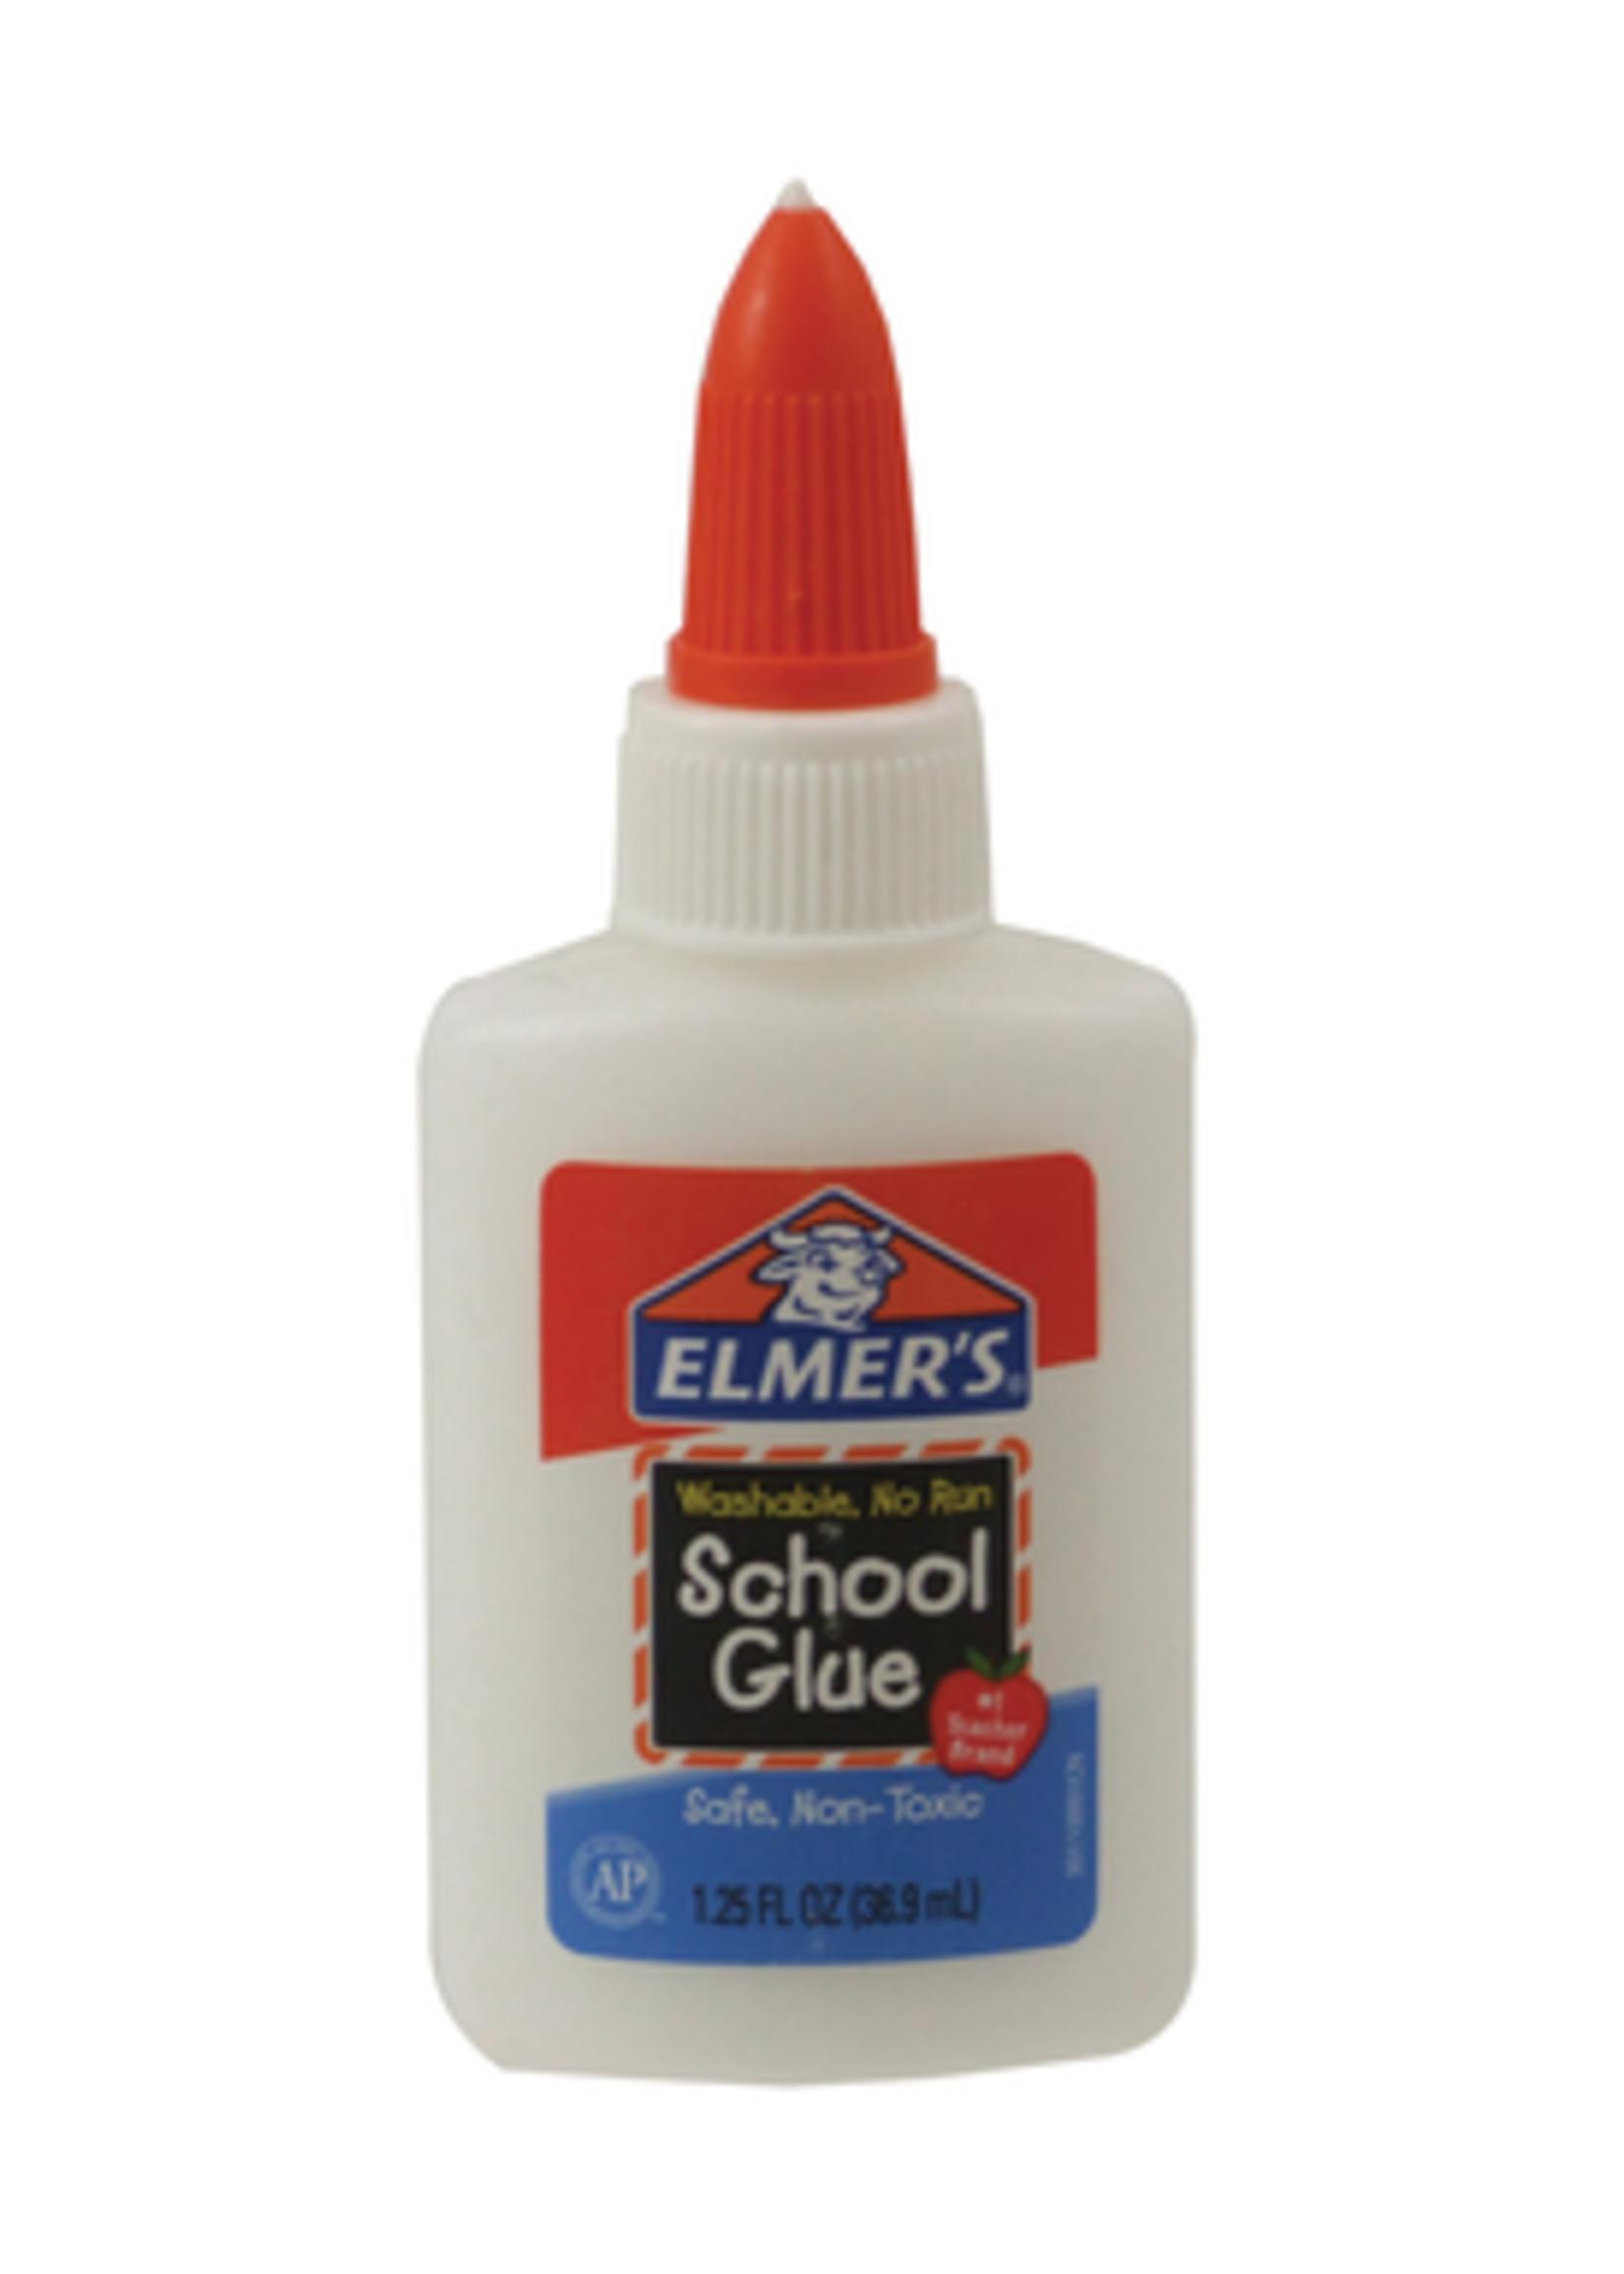 ELMERS CORPORATION ELMERS SCHOOL GLUE 1.25 OZ